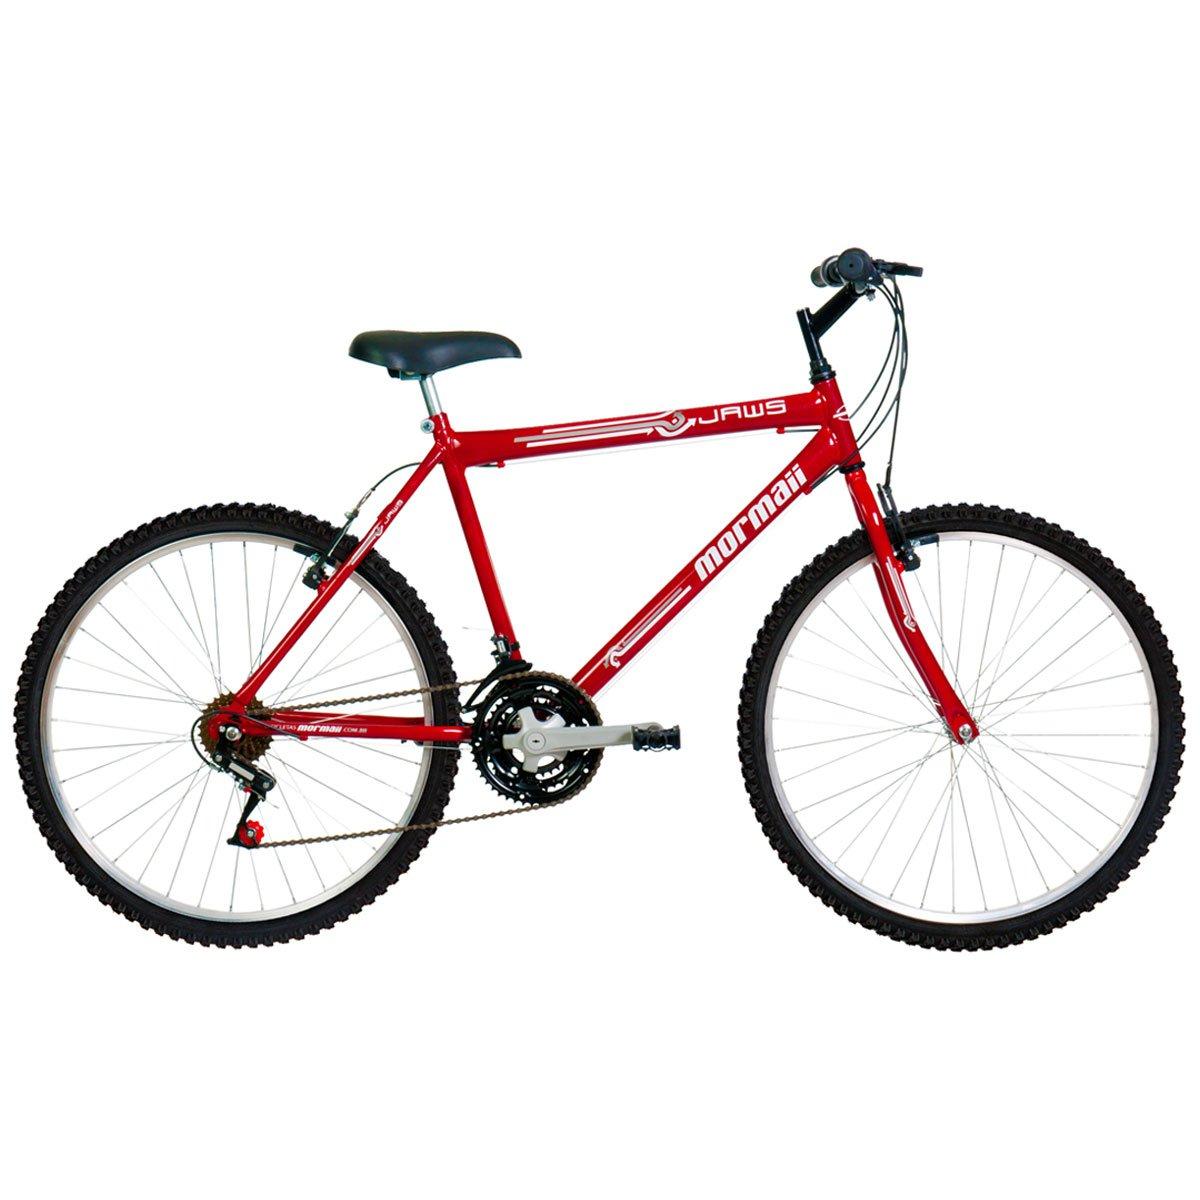 Foto 1 - Bicicleta Mormaii Jaws 21 V - Aro 26